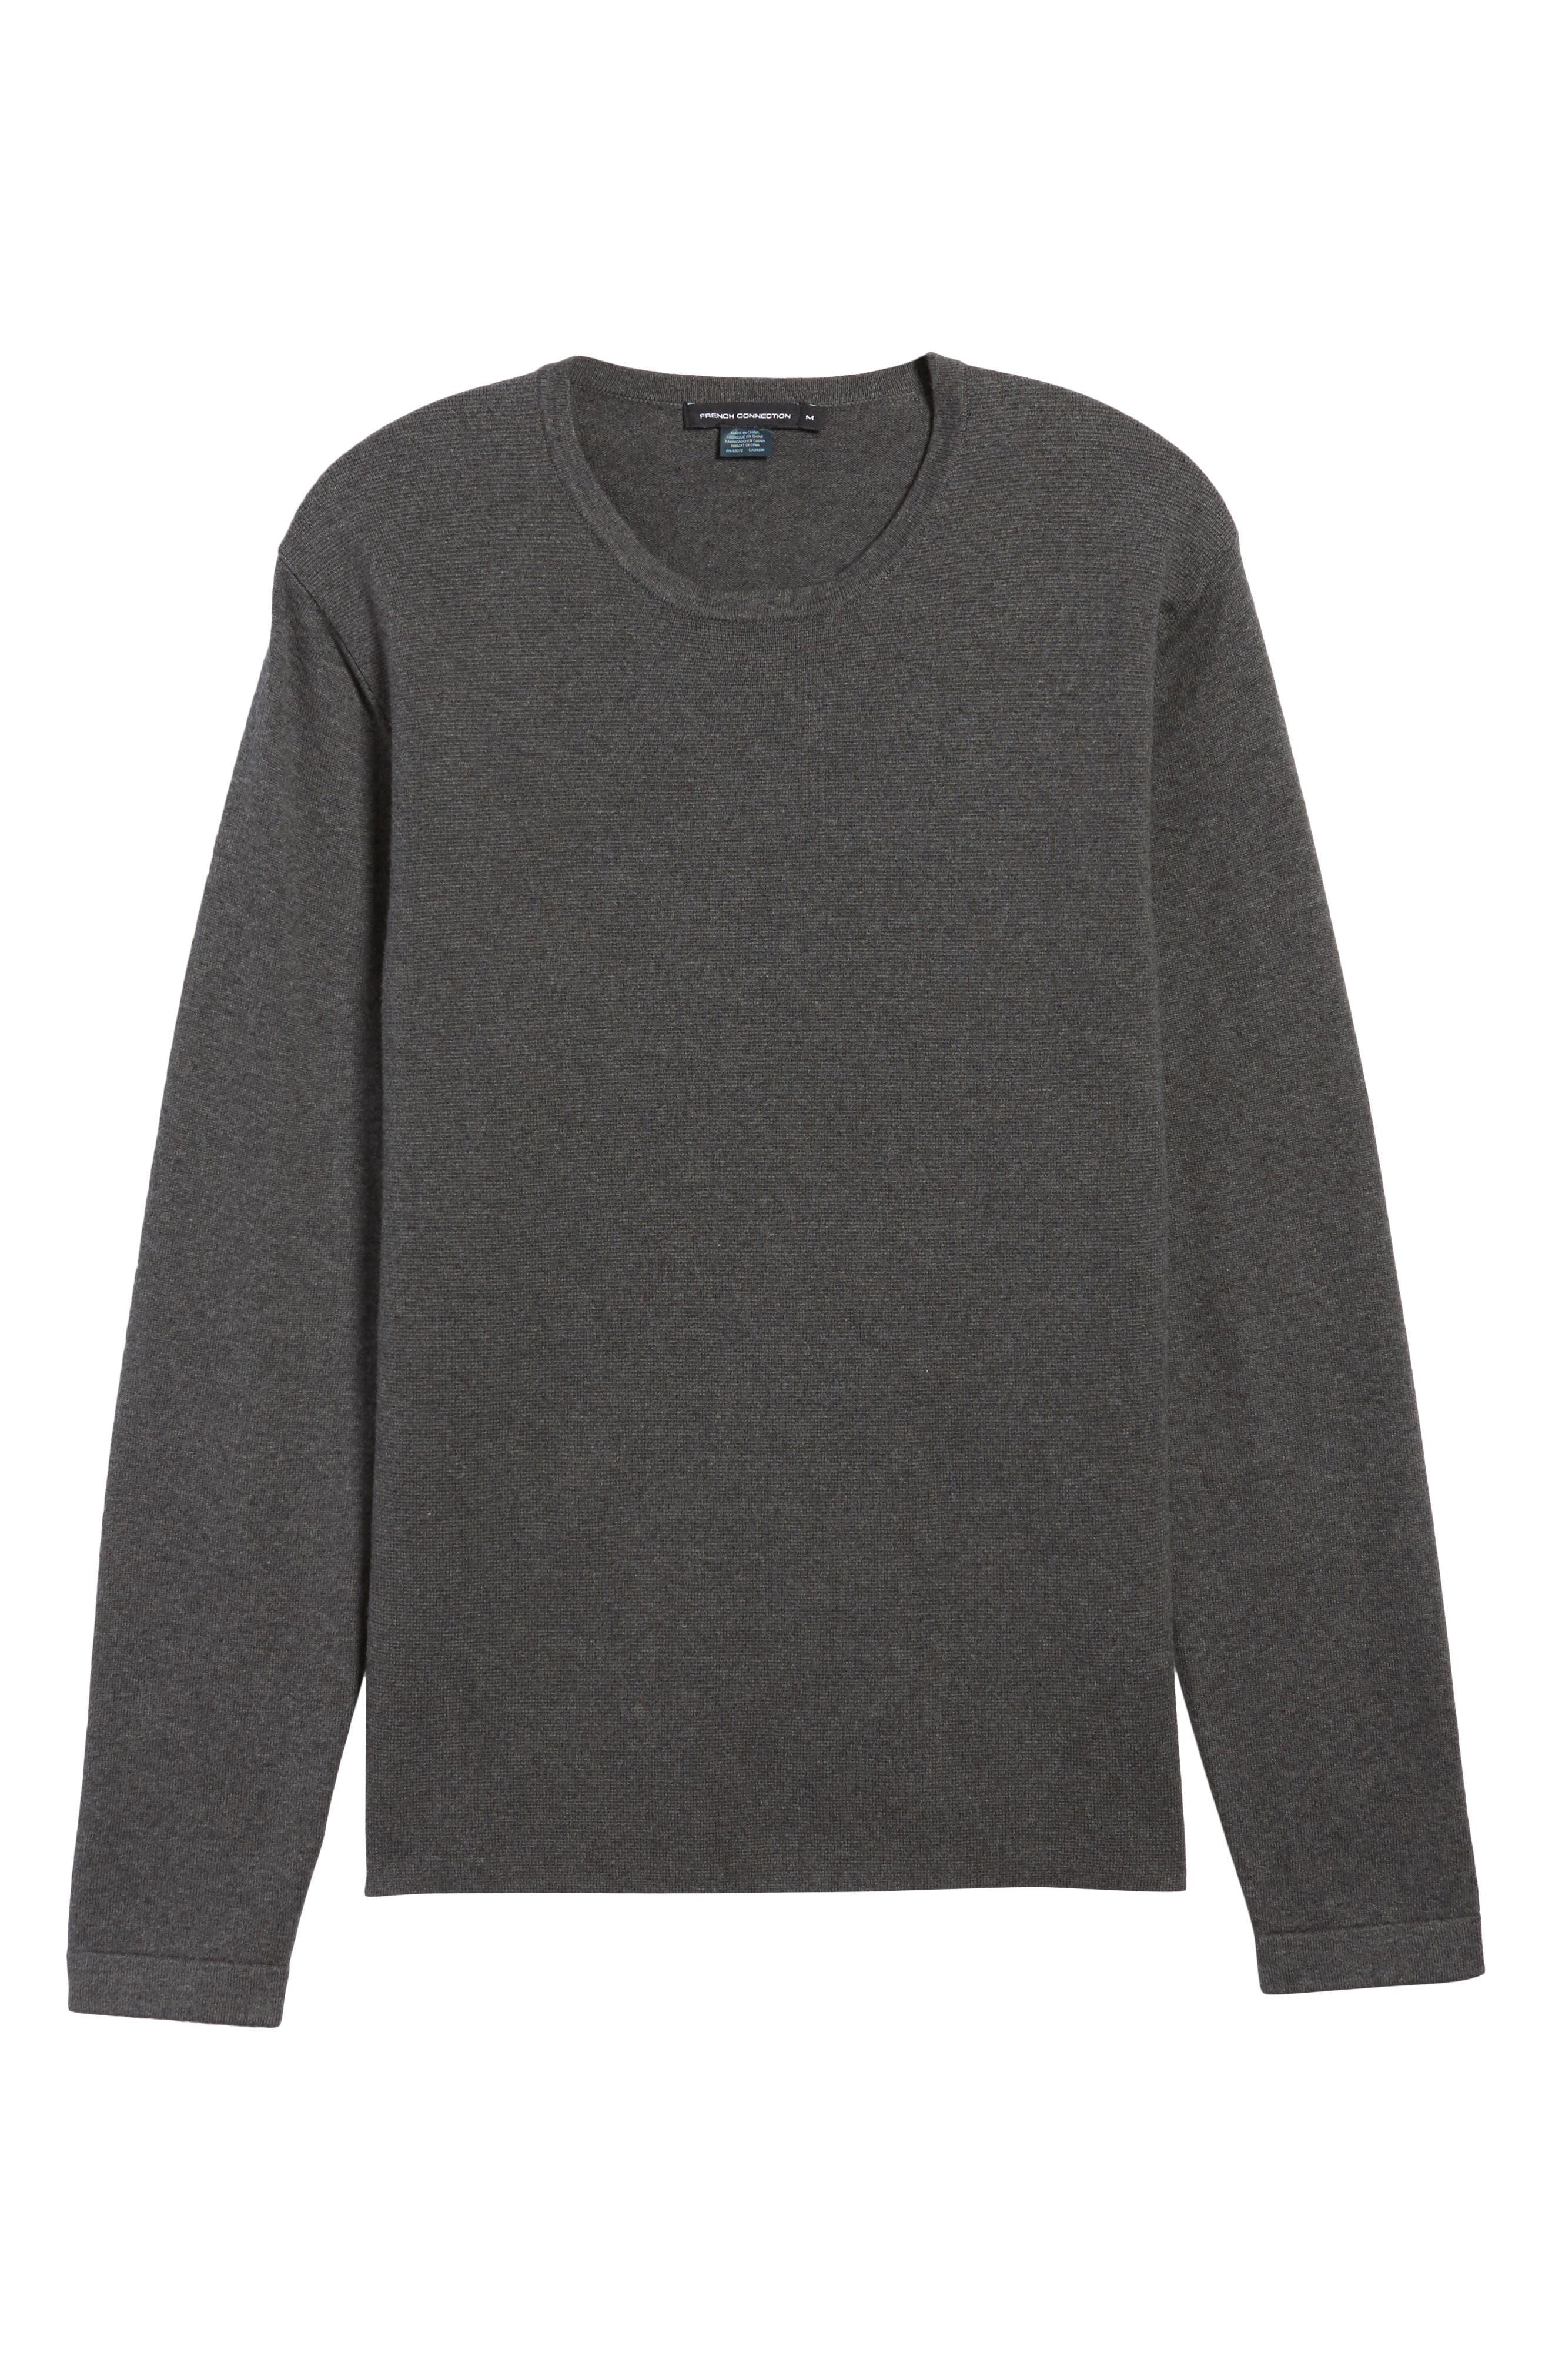 Milano Front Regular Fit Cotton Sweater,                             Alternate thumbnail 6, color,                             CHARCOAL MELANGE